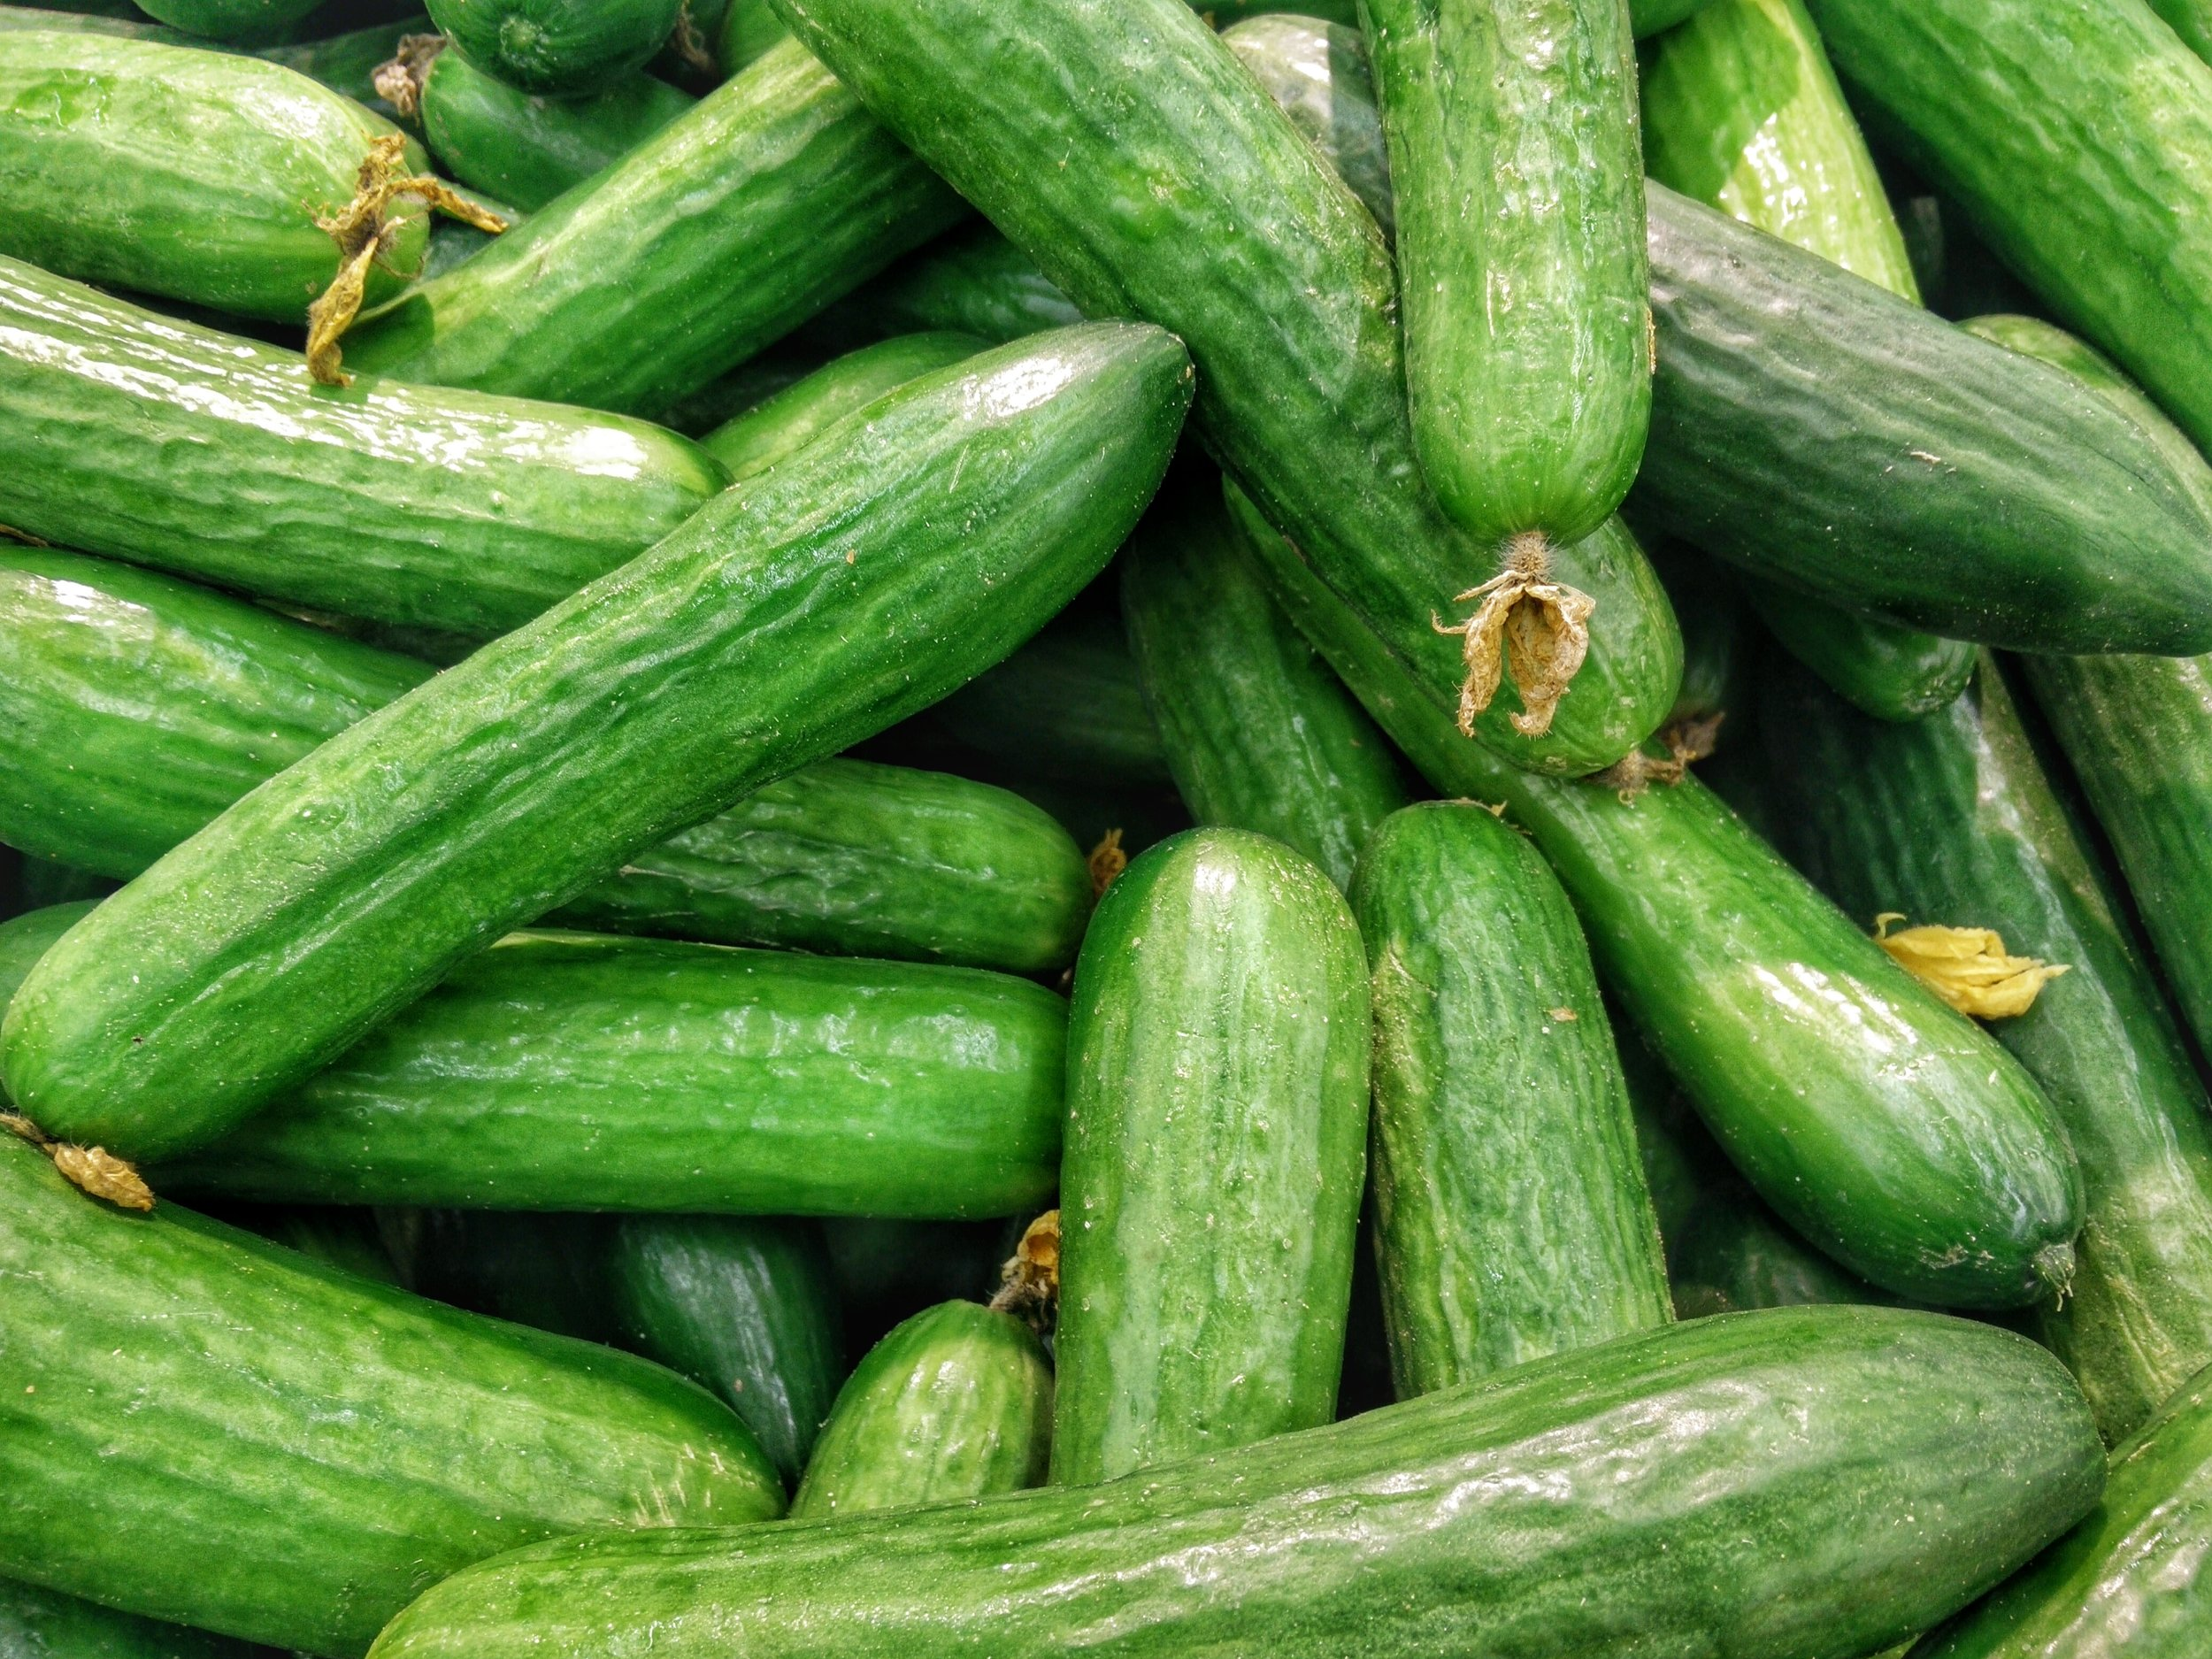 Cucumber - -Spacemaster-Armenian (Snake melon)-Telegraph-Lemon-Poinsette